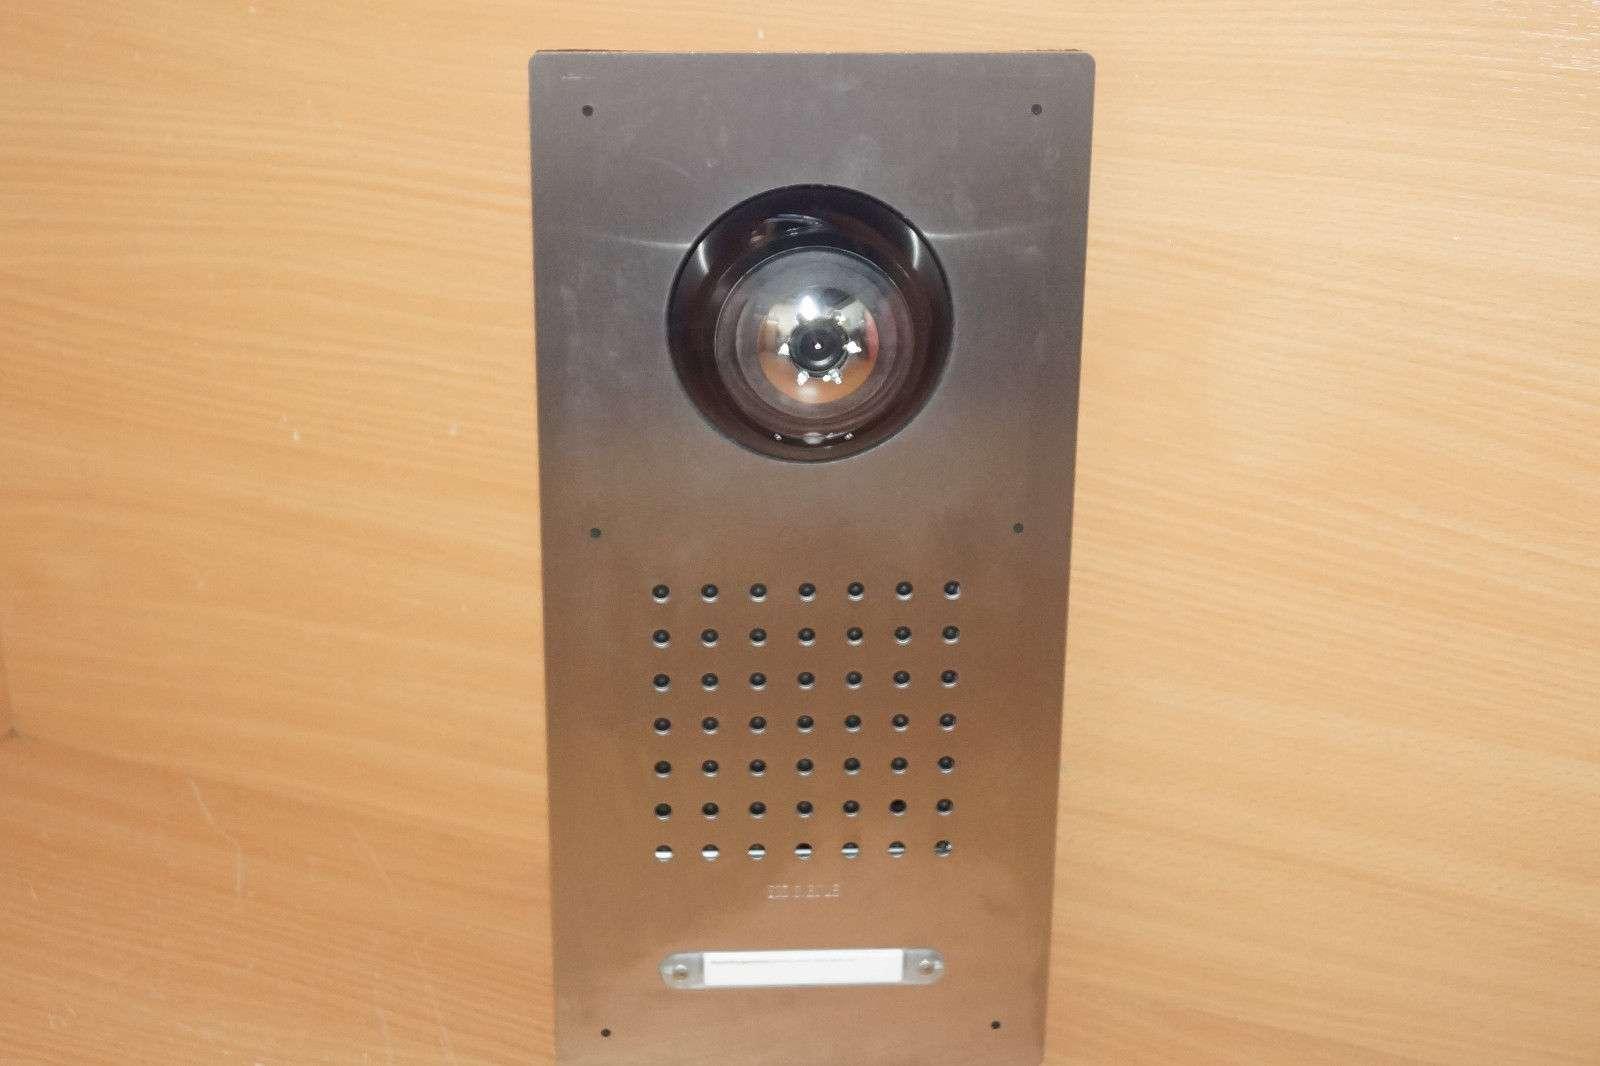 siedle video türstation classic video 1 klingel cmc 612-0 + tlm 612